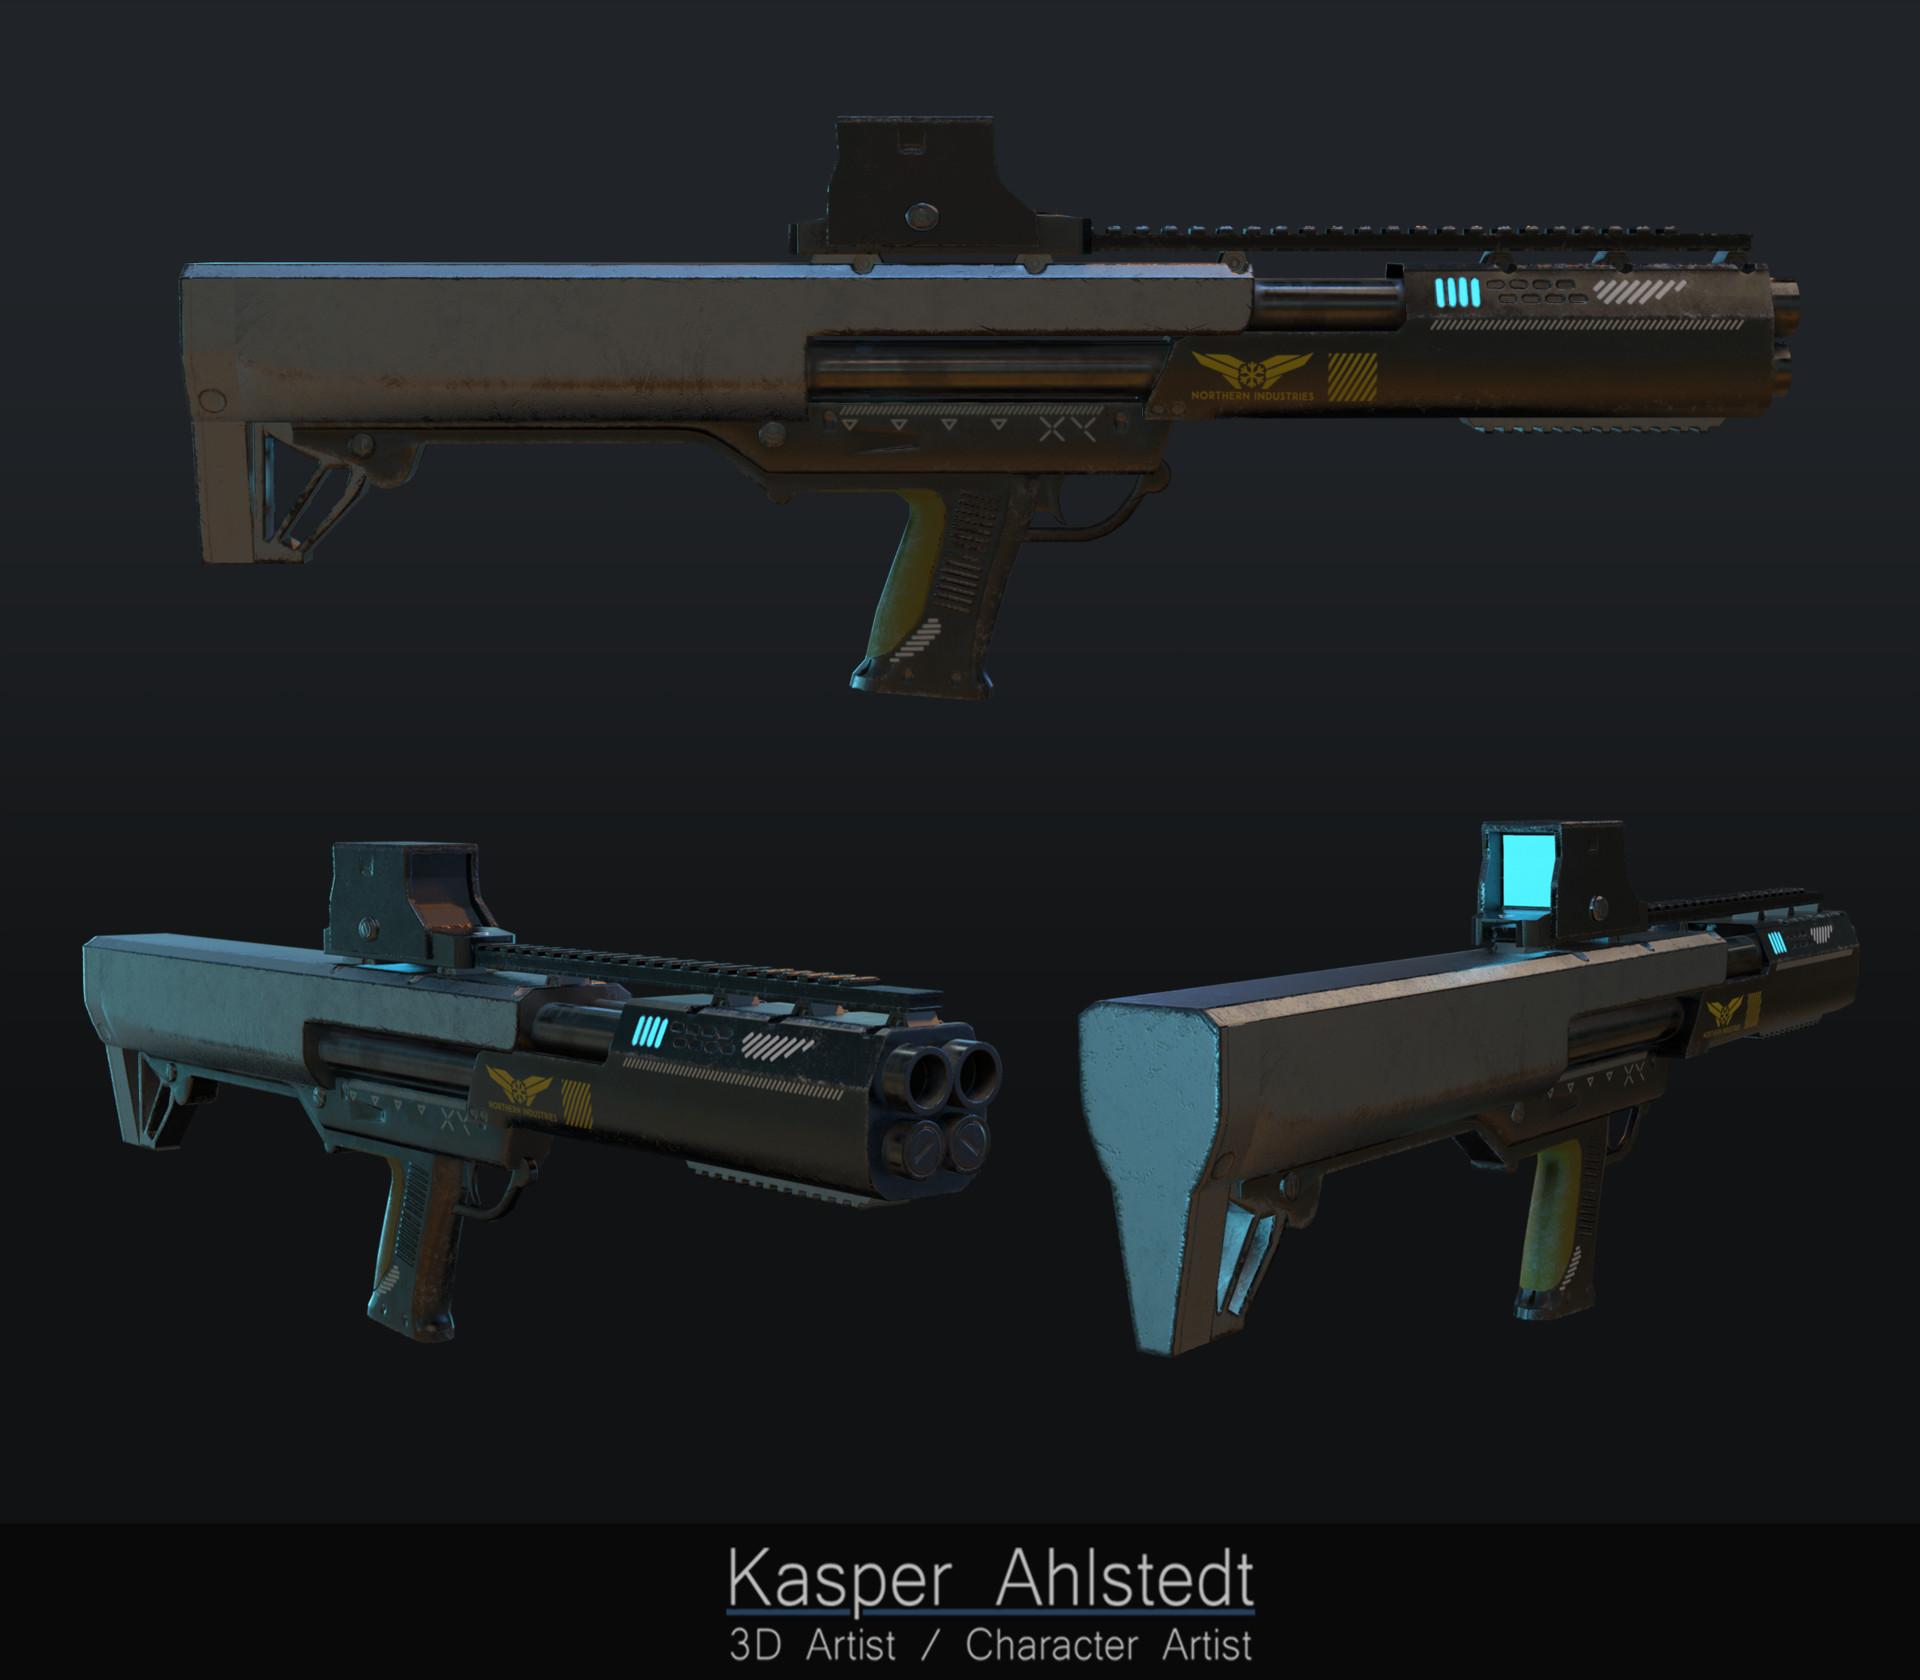 Kasper ahlstedt g7 shotgun